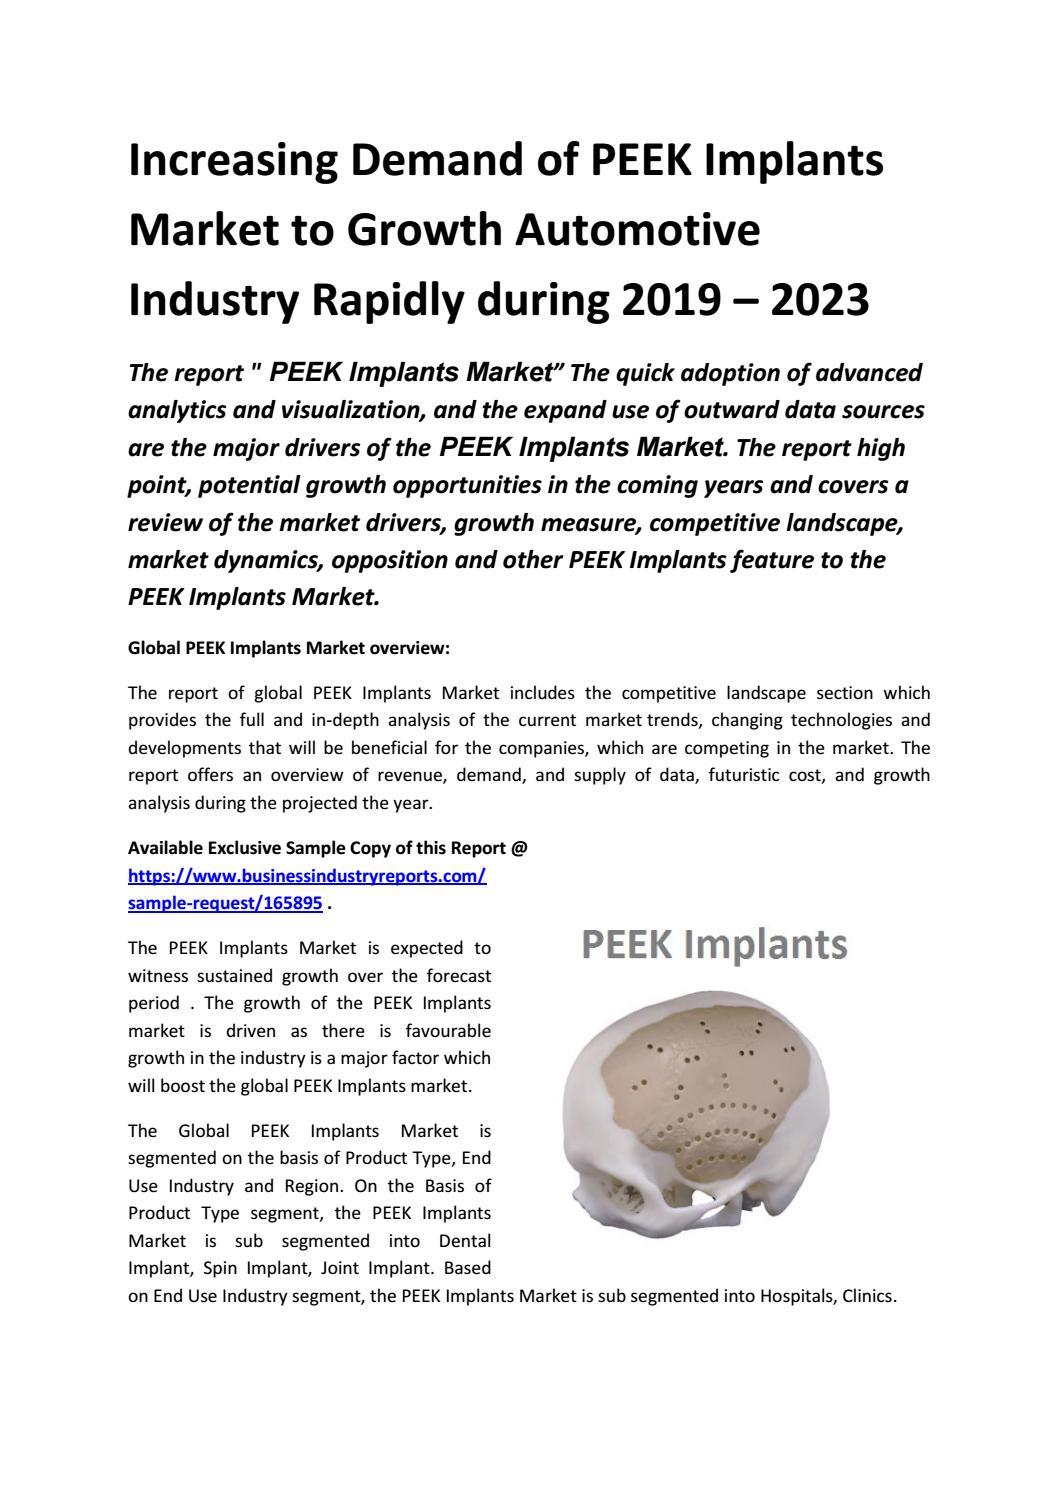 Increasing Demand of PEEK Implants Market to Growth